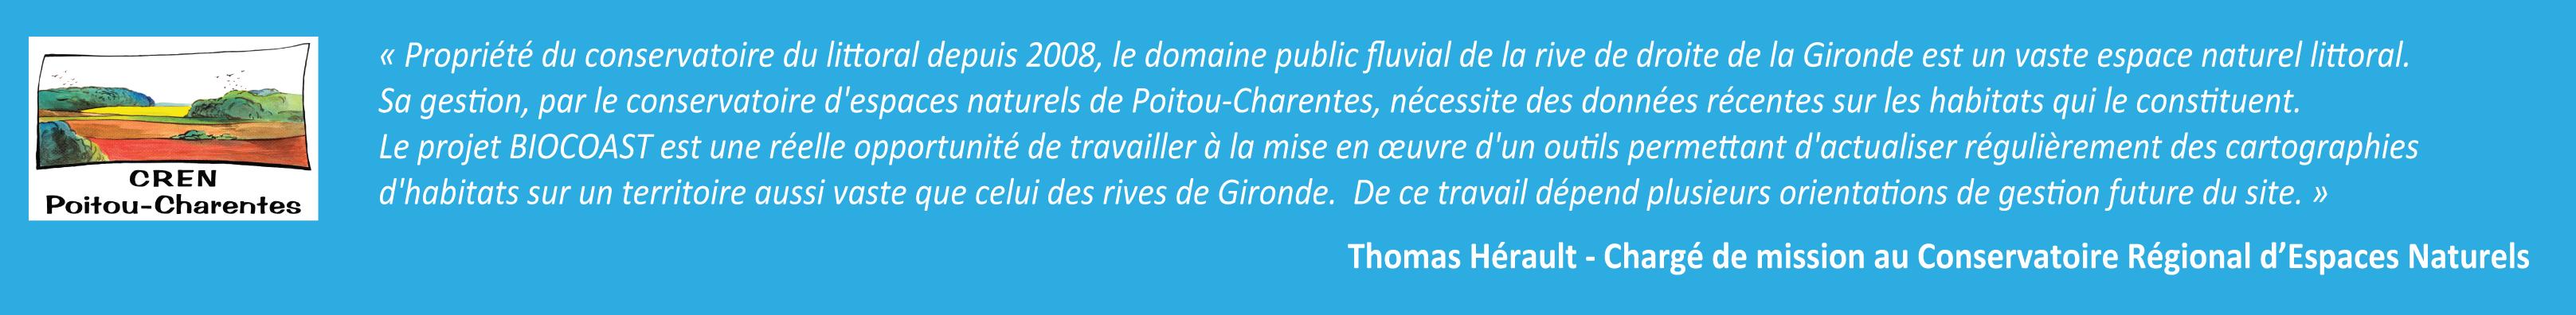 Thomas Hérault